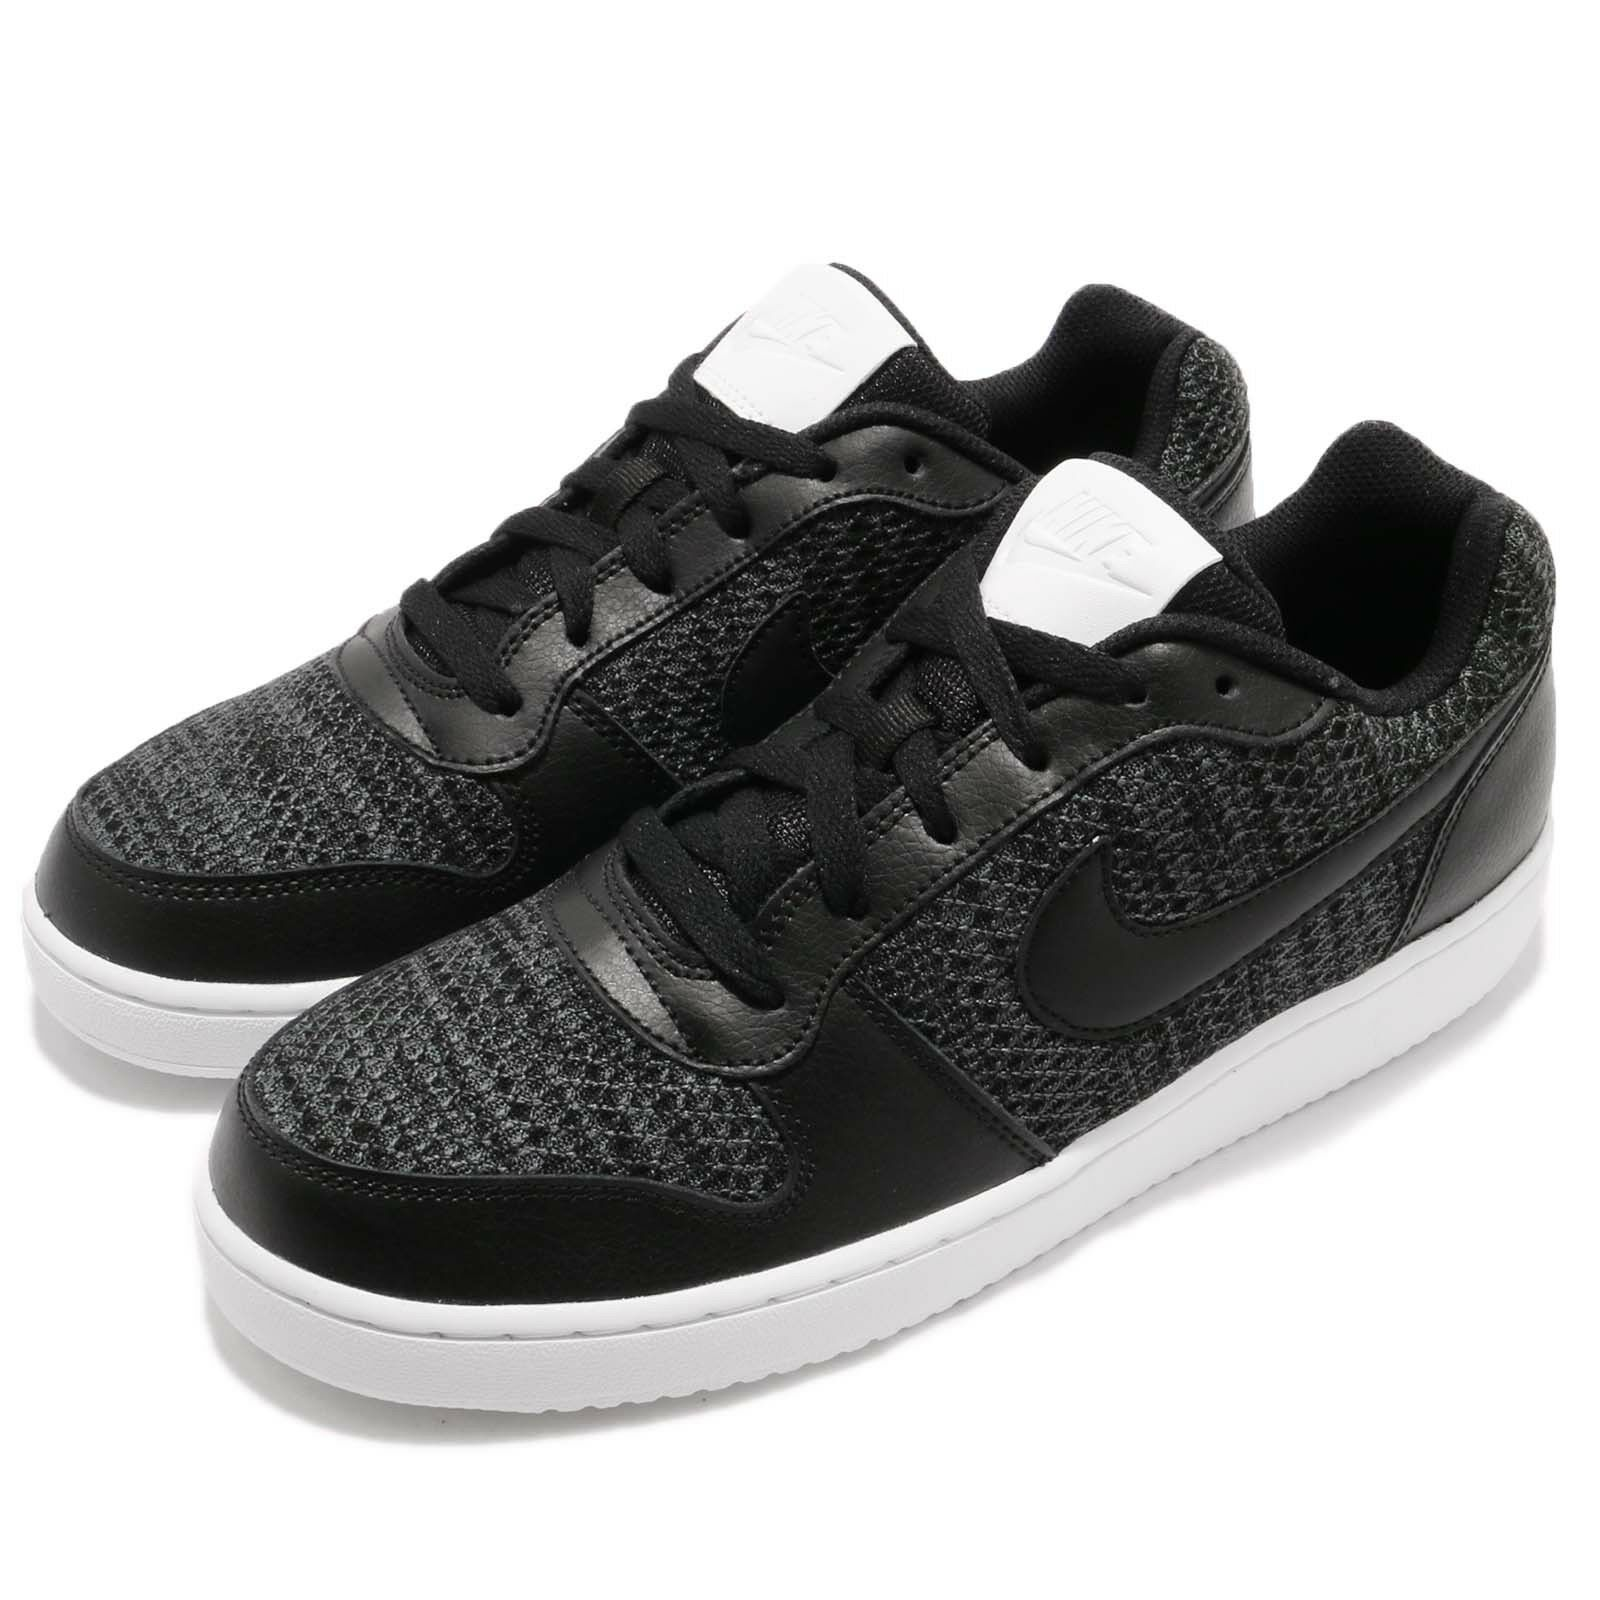 Nike Ebernon Low PREM Premium Noir Blanc Homme Casual Chaussures Sneakers AQ1774-001